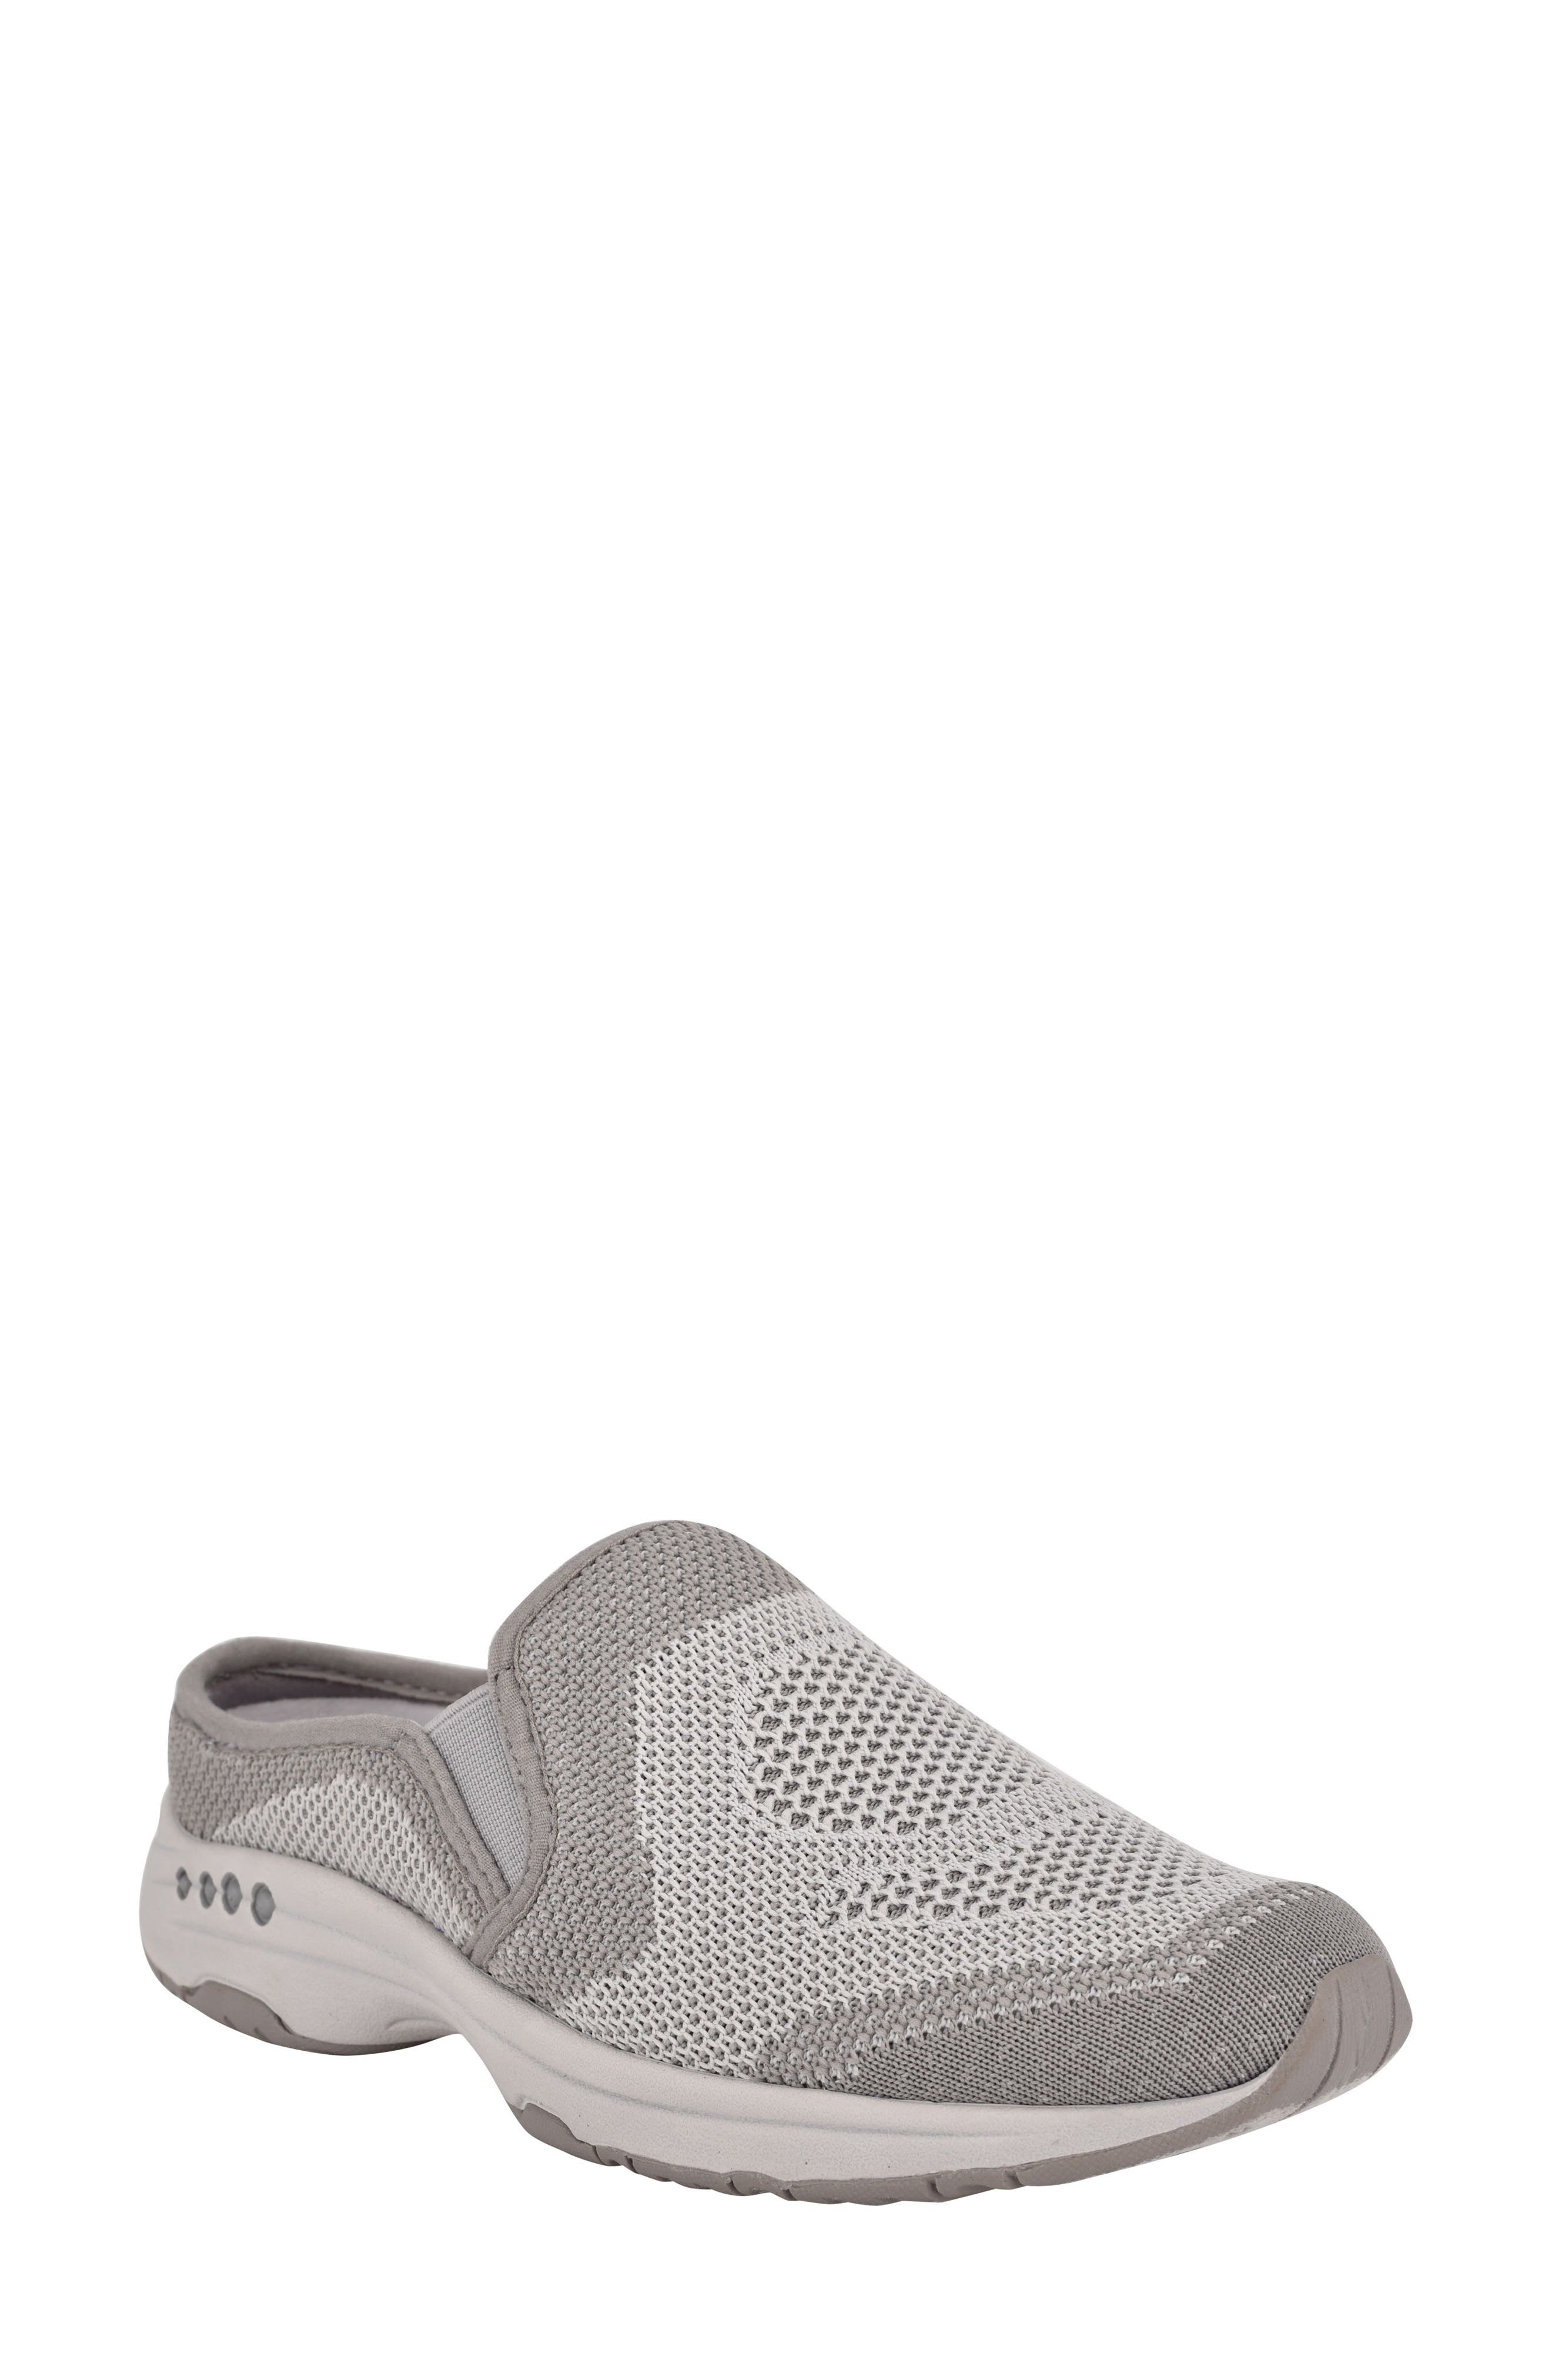 Take Knit Slip-On Sneaker